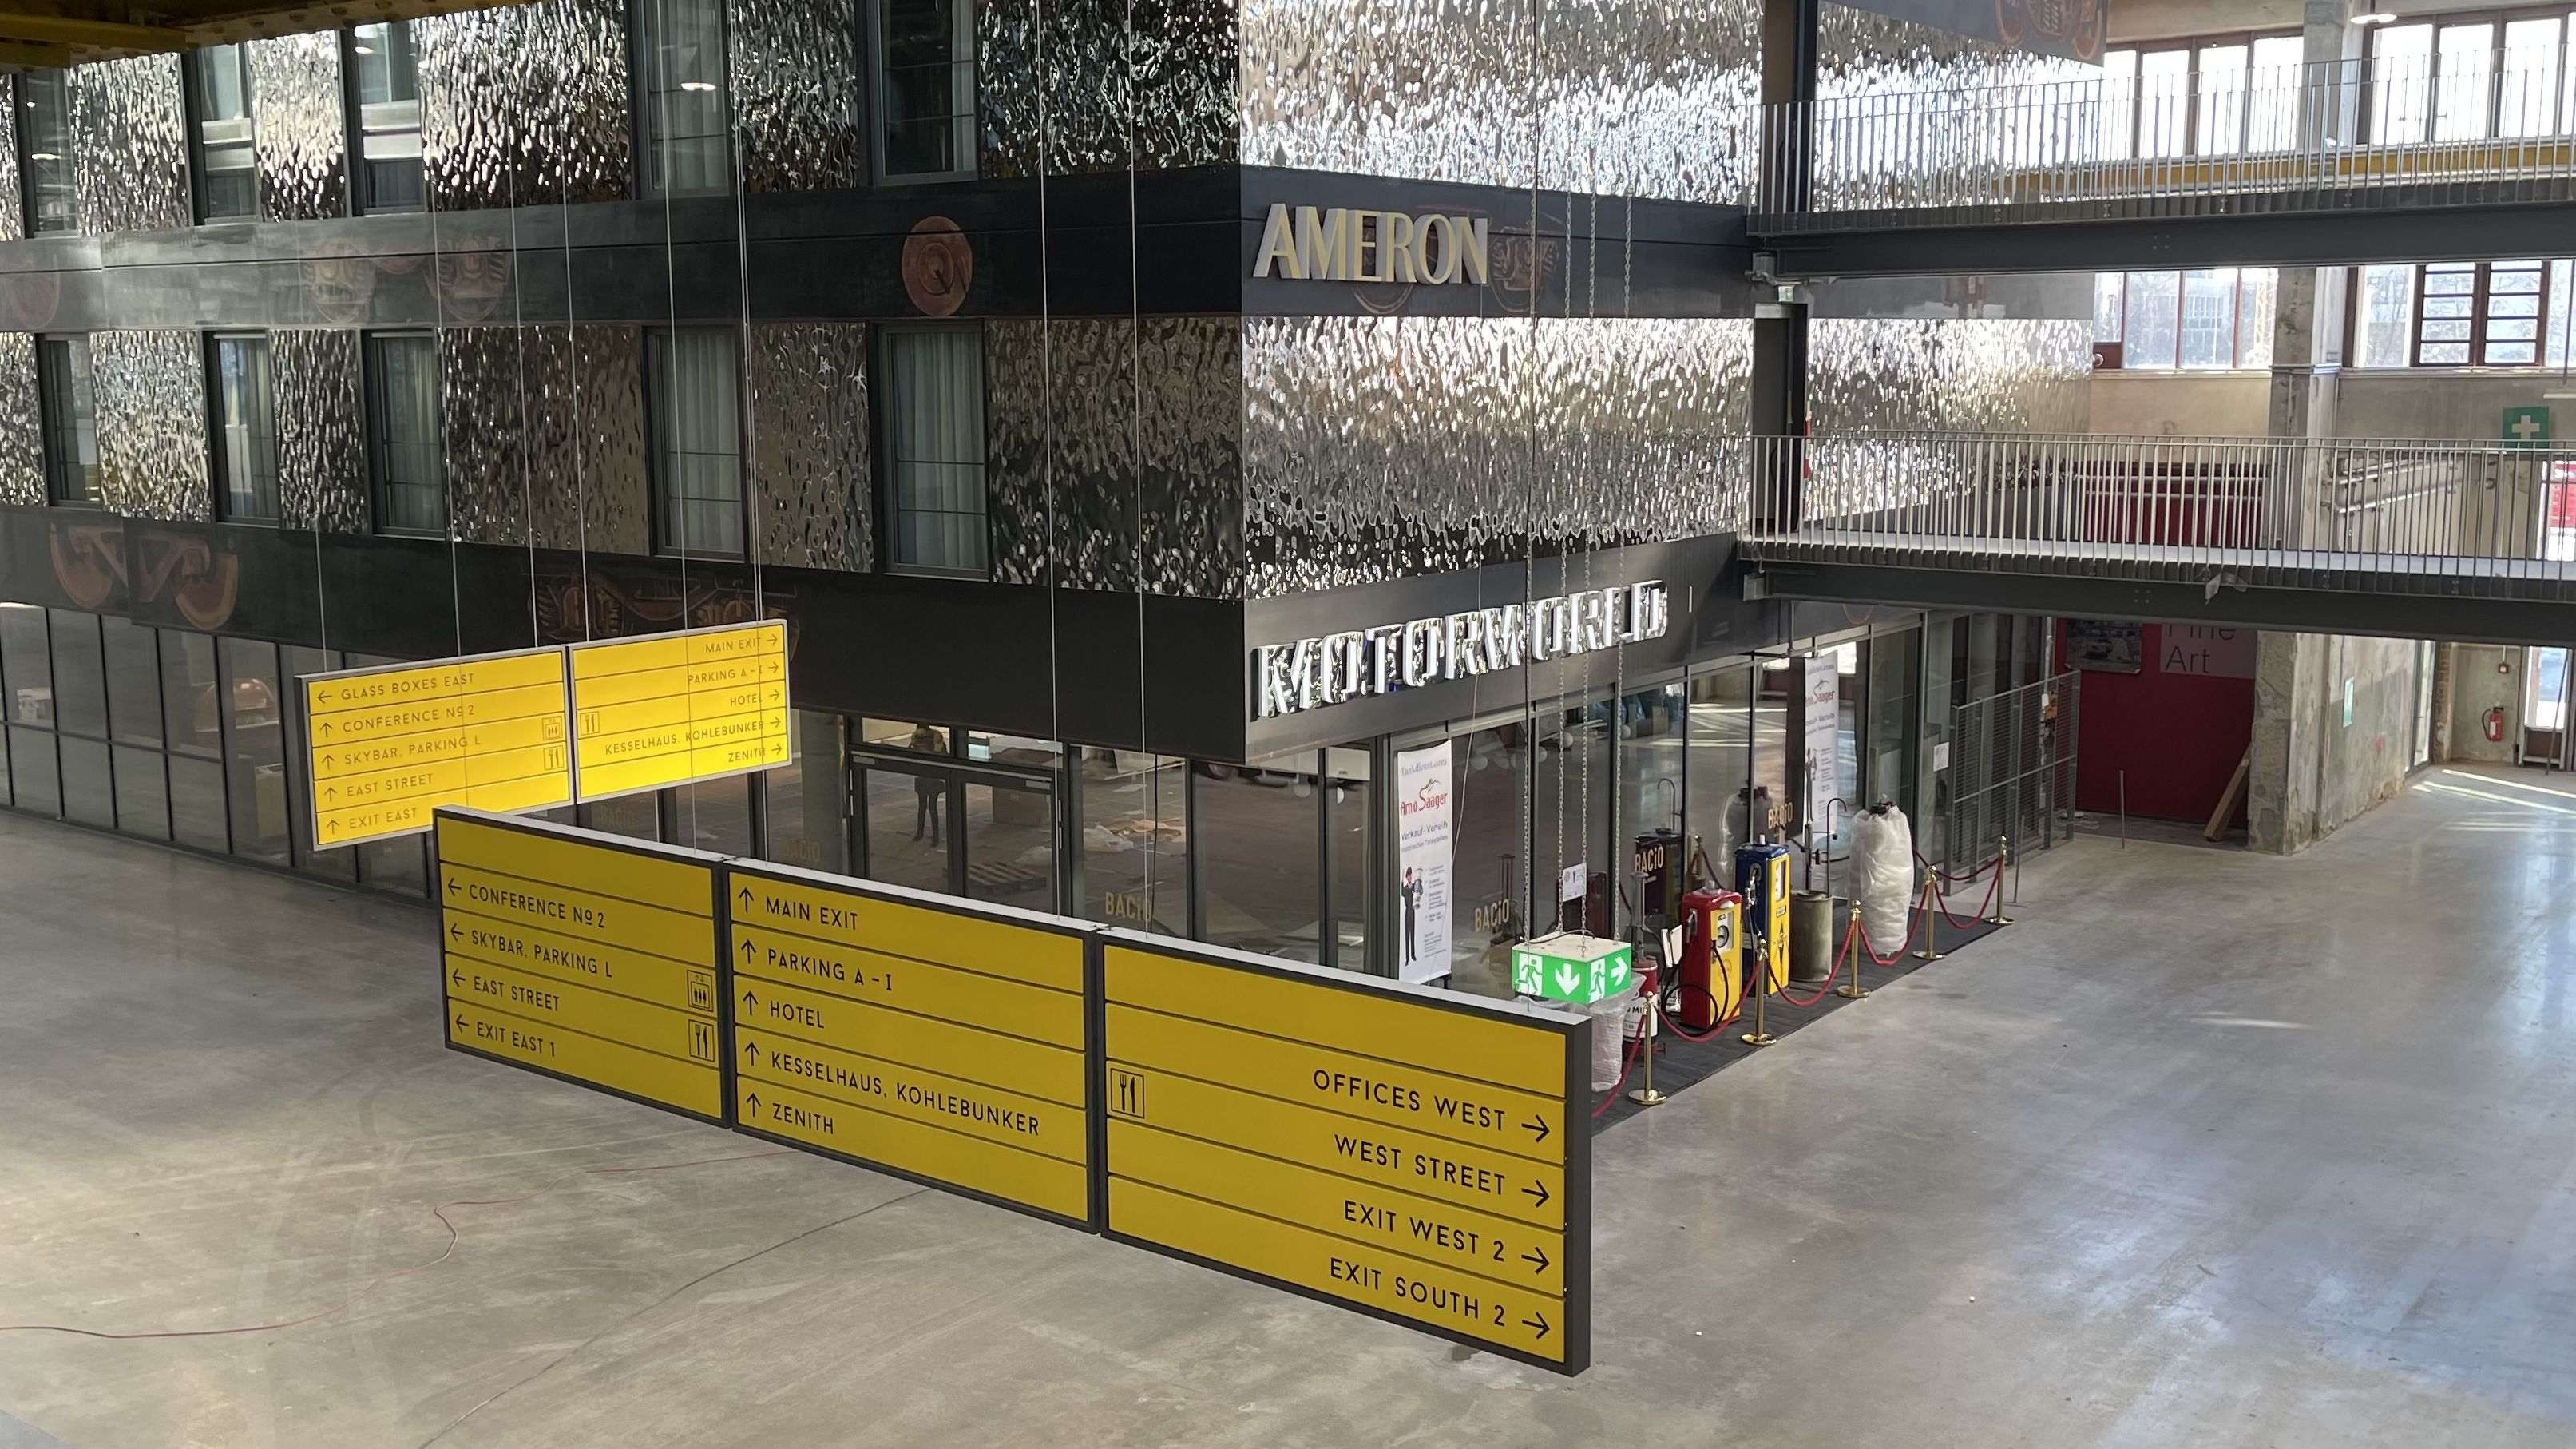 Neuer-ffnung-Hospitality-Events-Automobil-M-nchen-bekommt-ein-Ameron-Hotel